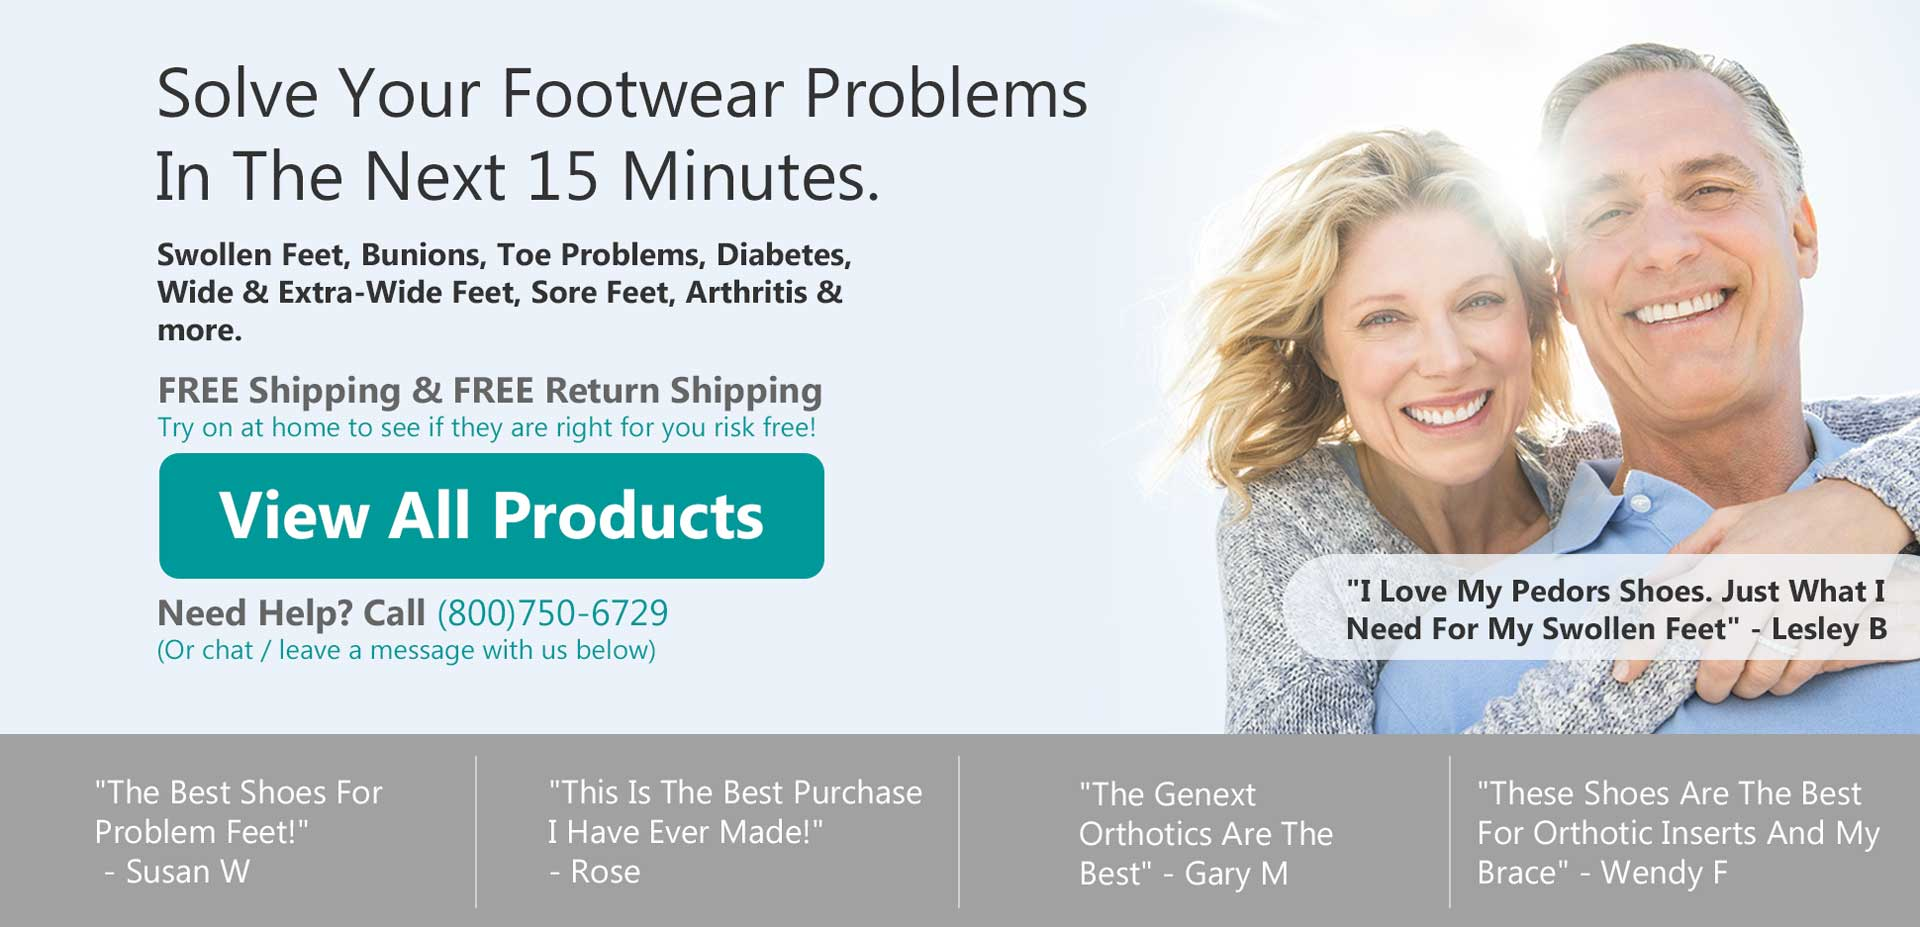 Pedors Stretch Orthopedic Shoes For Swollen Feet Edema Lymphedema Diabetes Arthritis Hammertoes Bunions Plantar Fasciitis Heel Pain Metatarsalgia Ball of foot pain Hallux Valgus